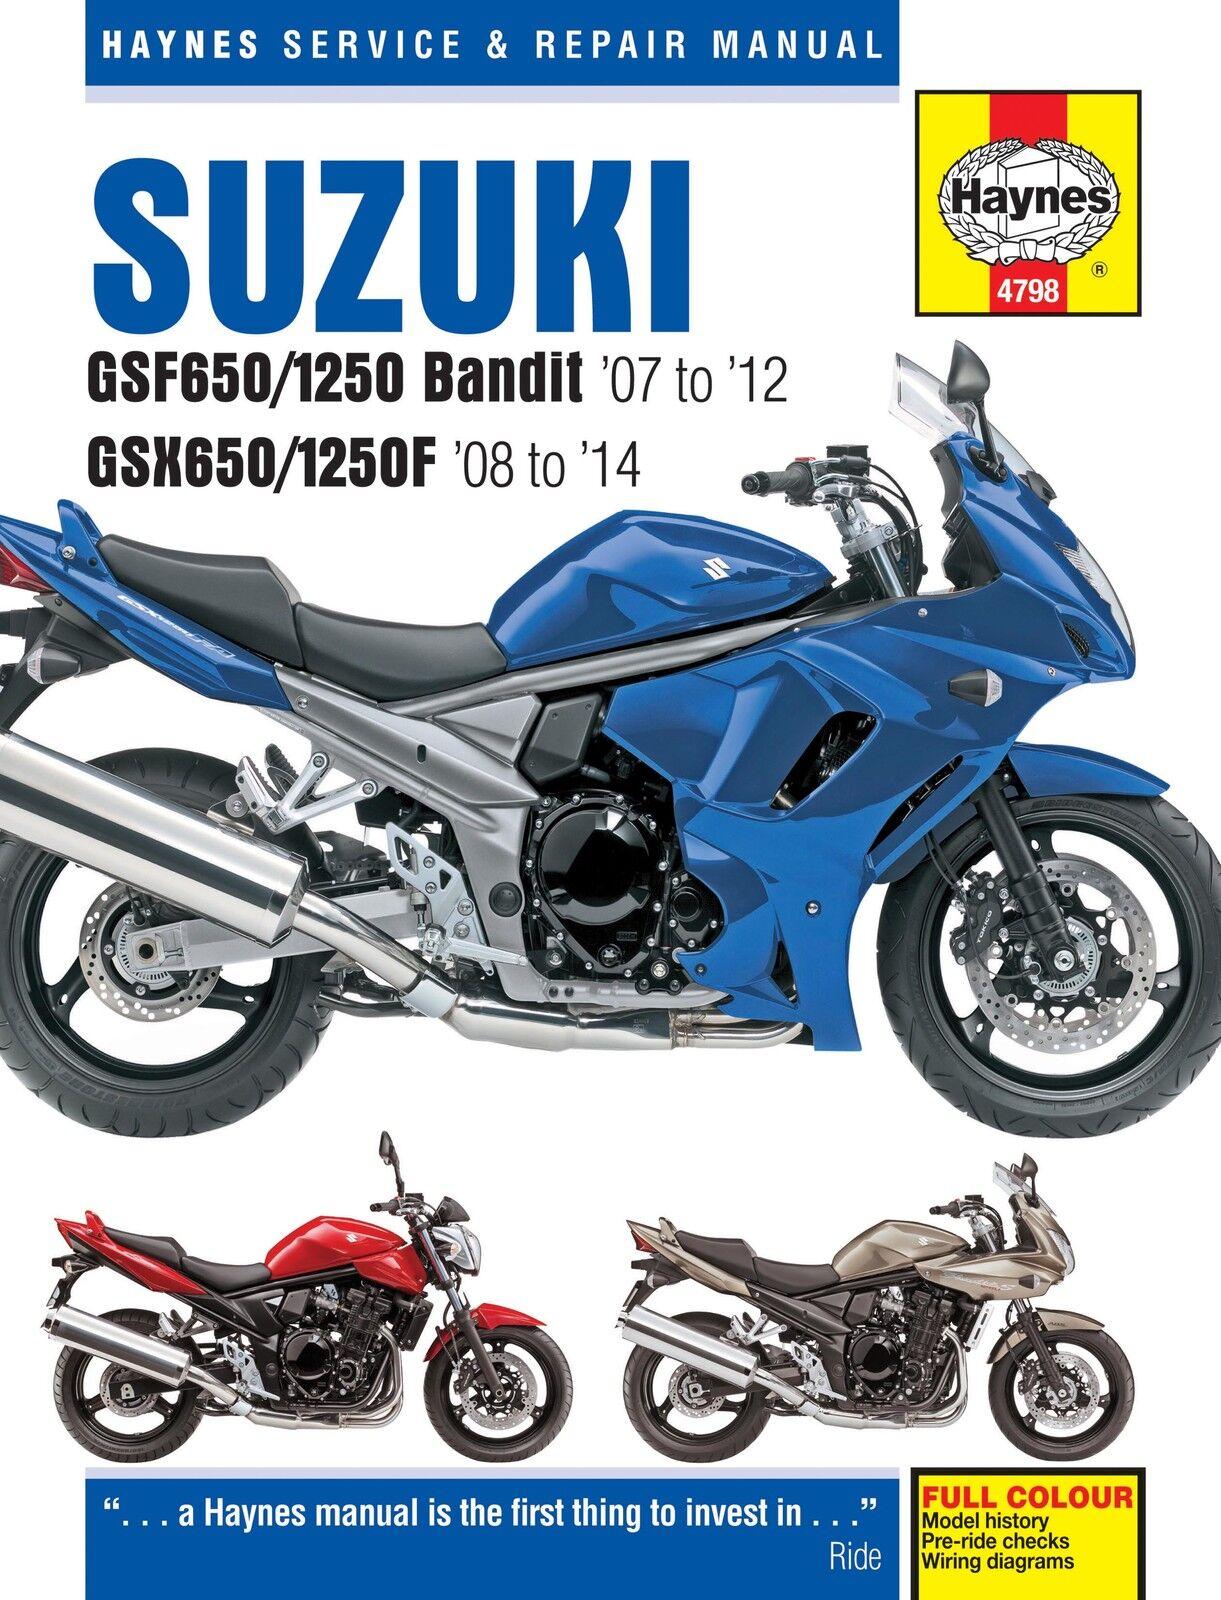 haynes 4798 motorcycle repair manual suzuki gsf650 bandit gsx650f 07 rh ebay com Spanish Motorcycle Suzuki SV 650 1998